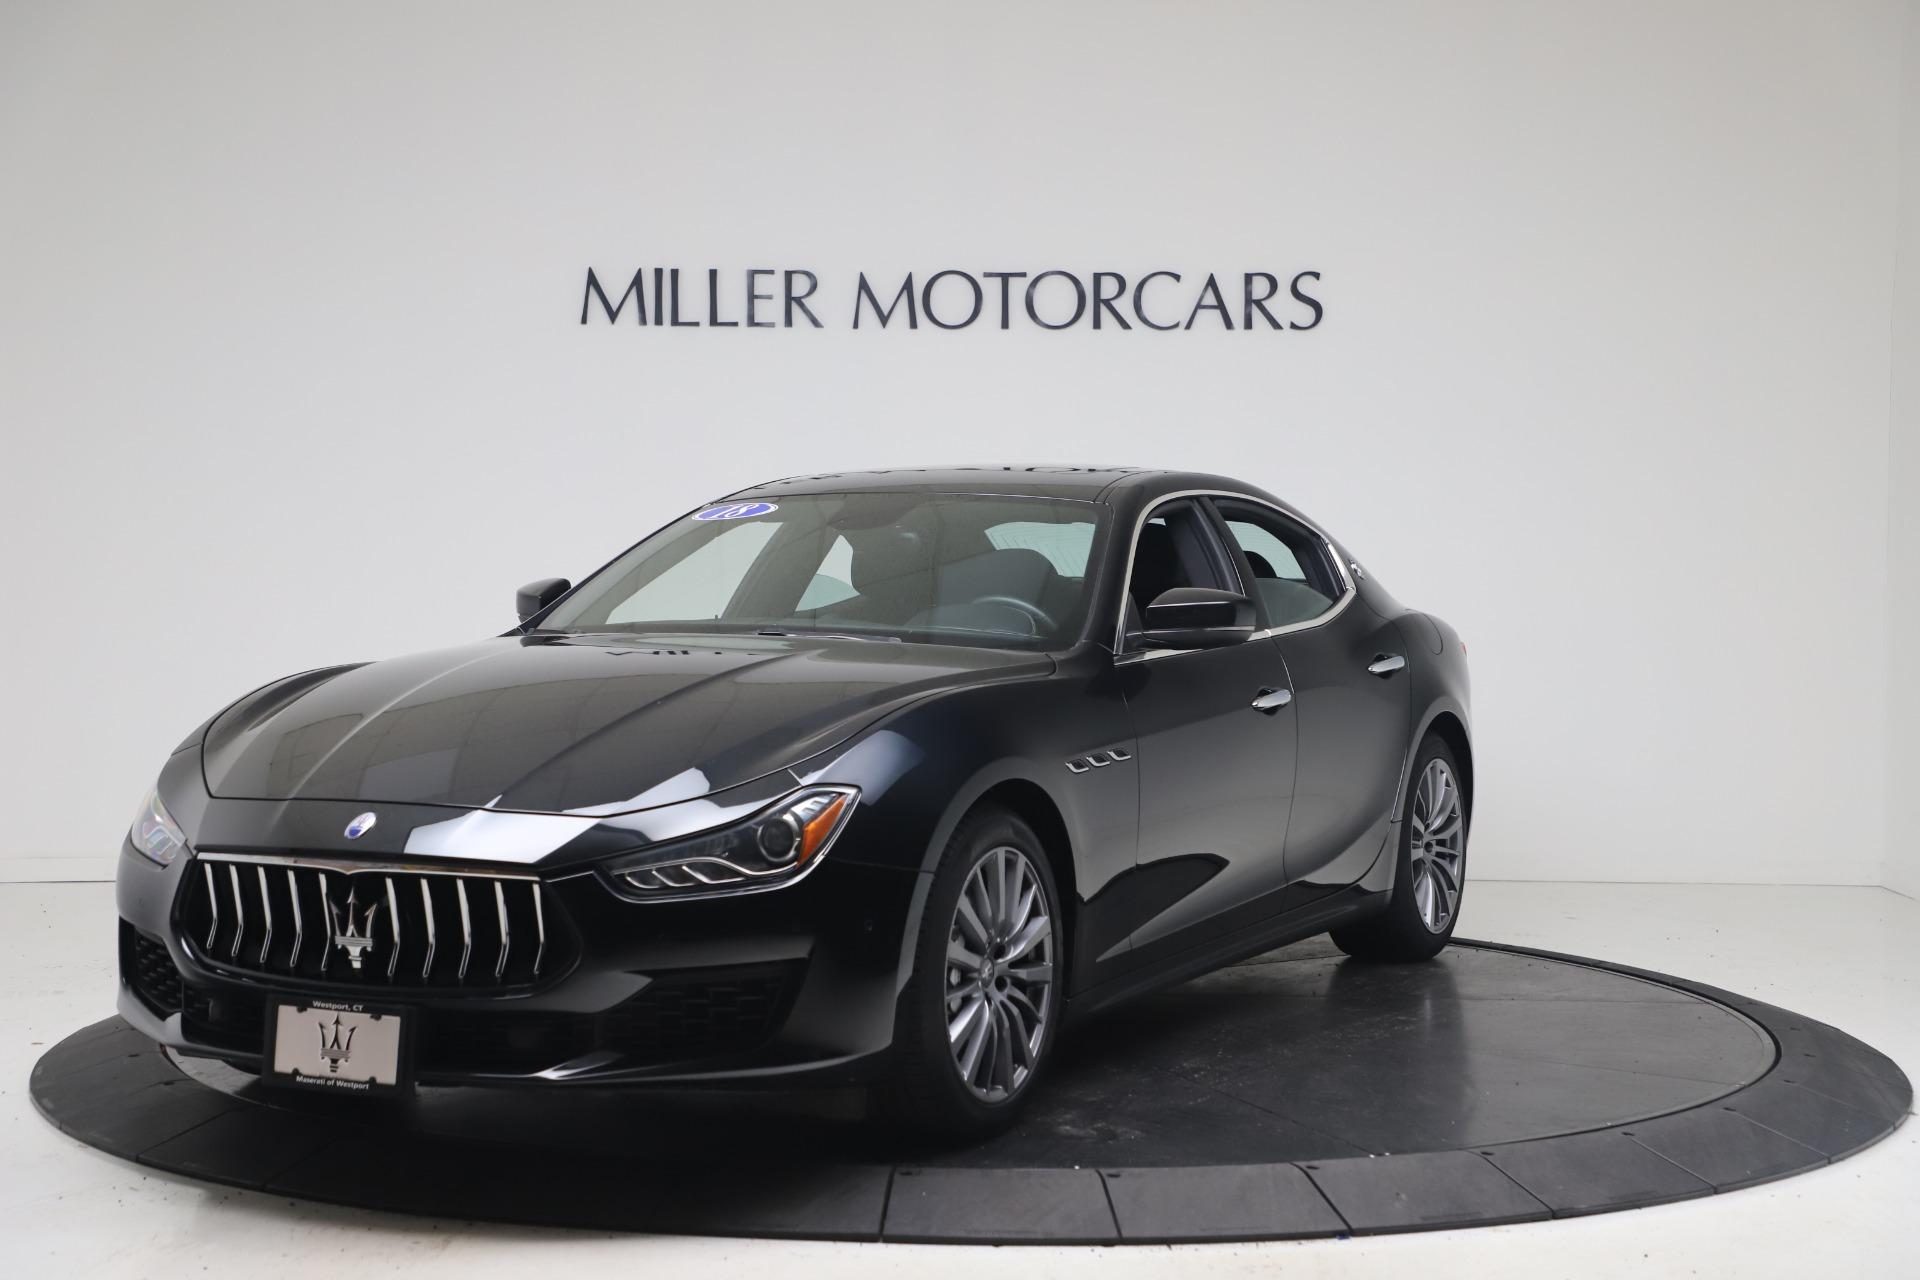 Used 2018 Maserati Ghibli SQ4 for sale $54,900 at Pagani of Greenwich in Greenwich CT 06830 1